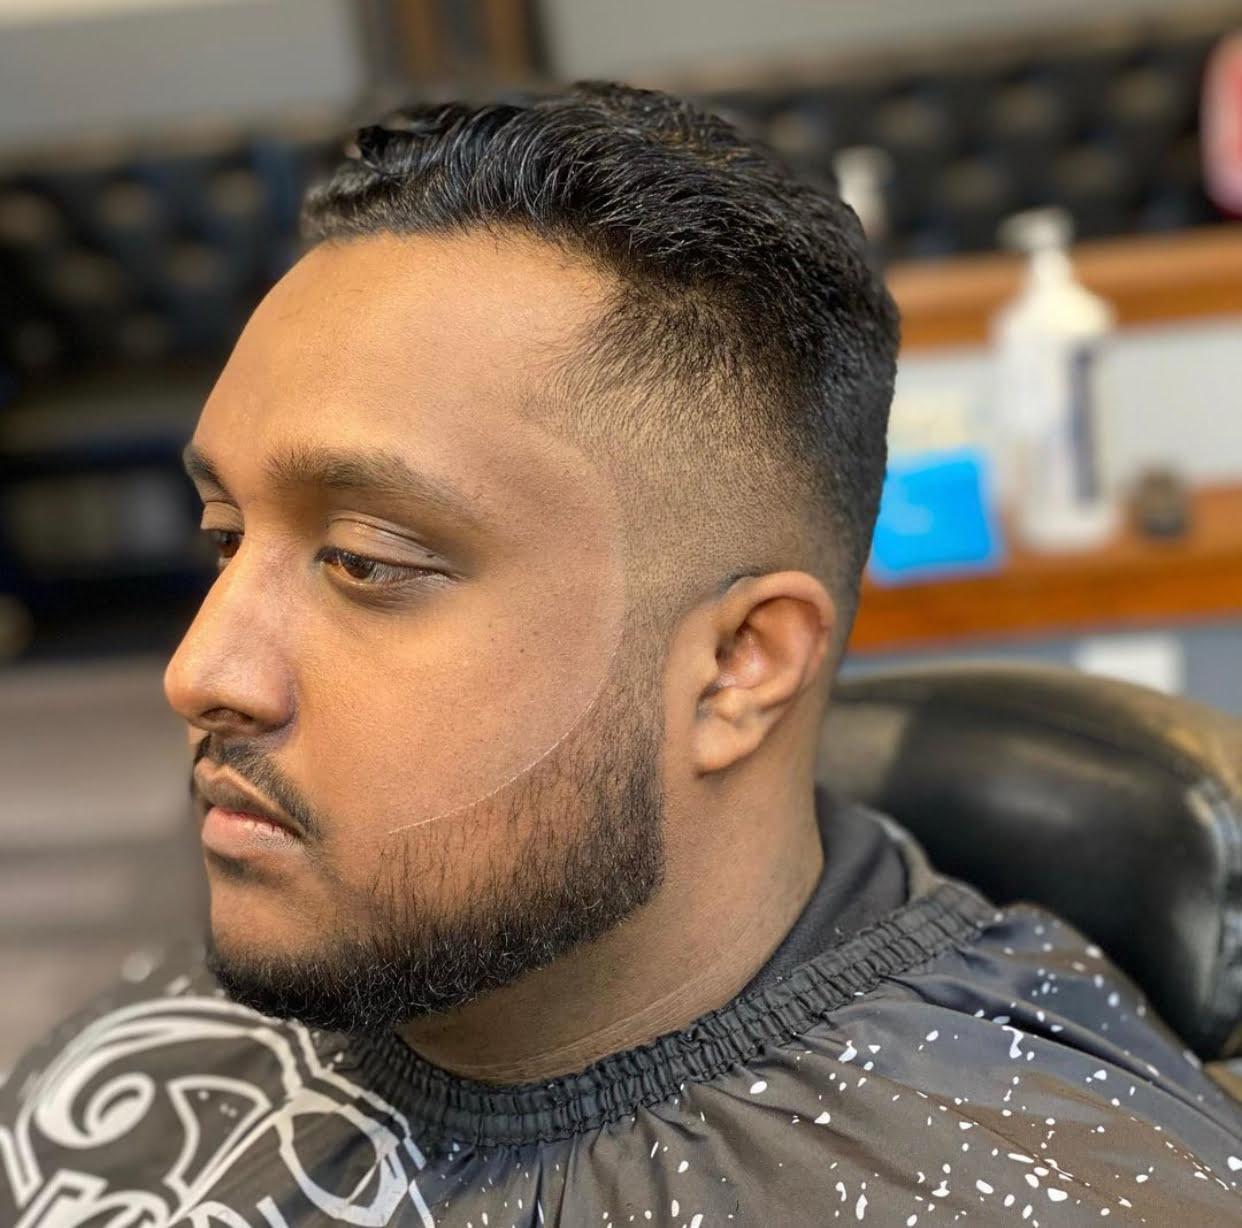 Barber_Gio4